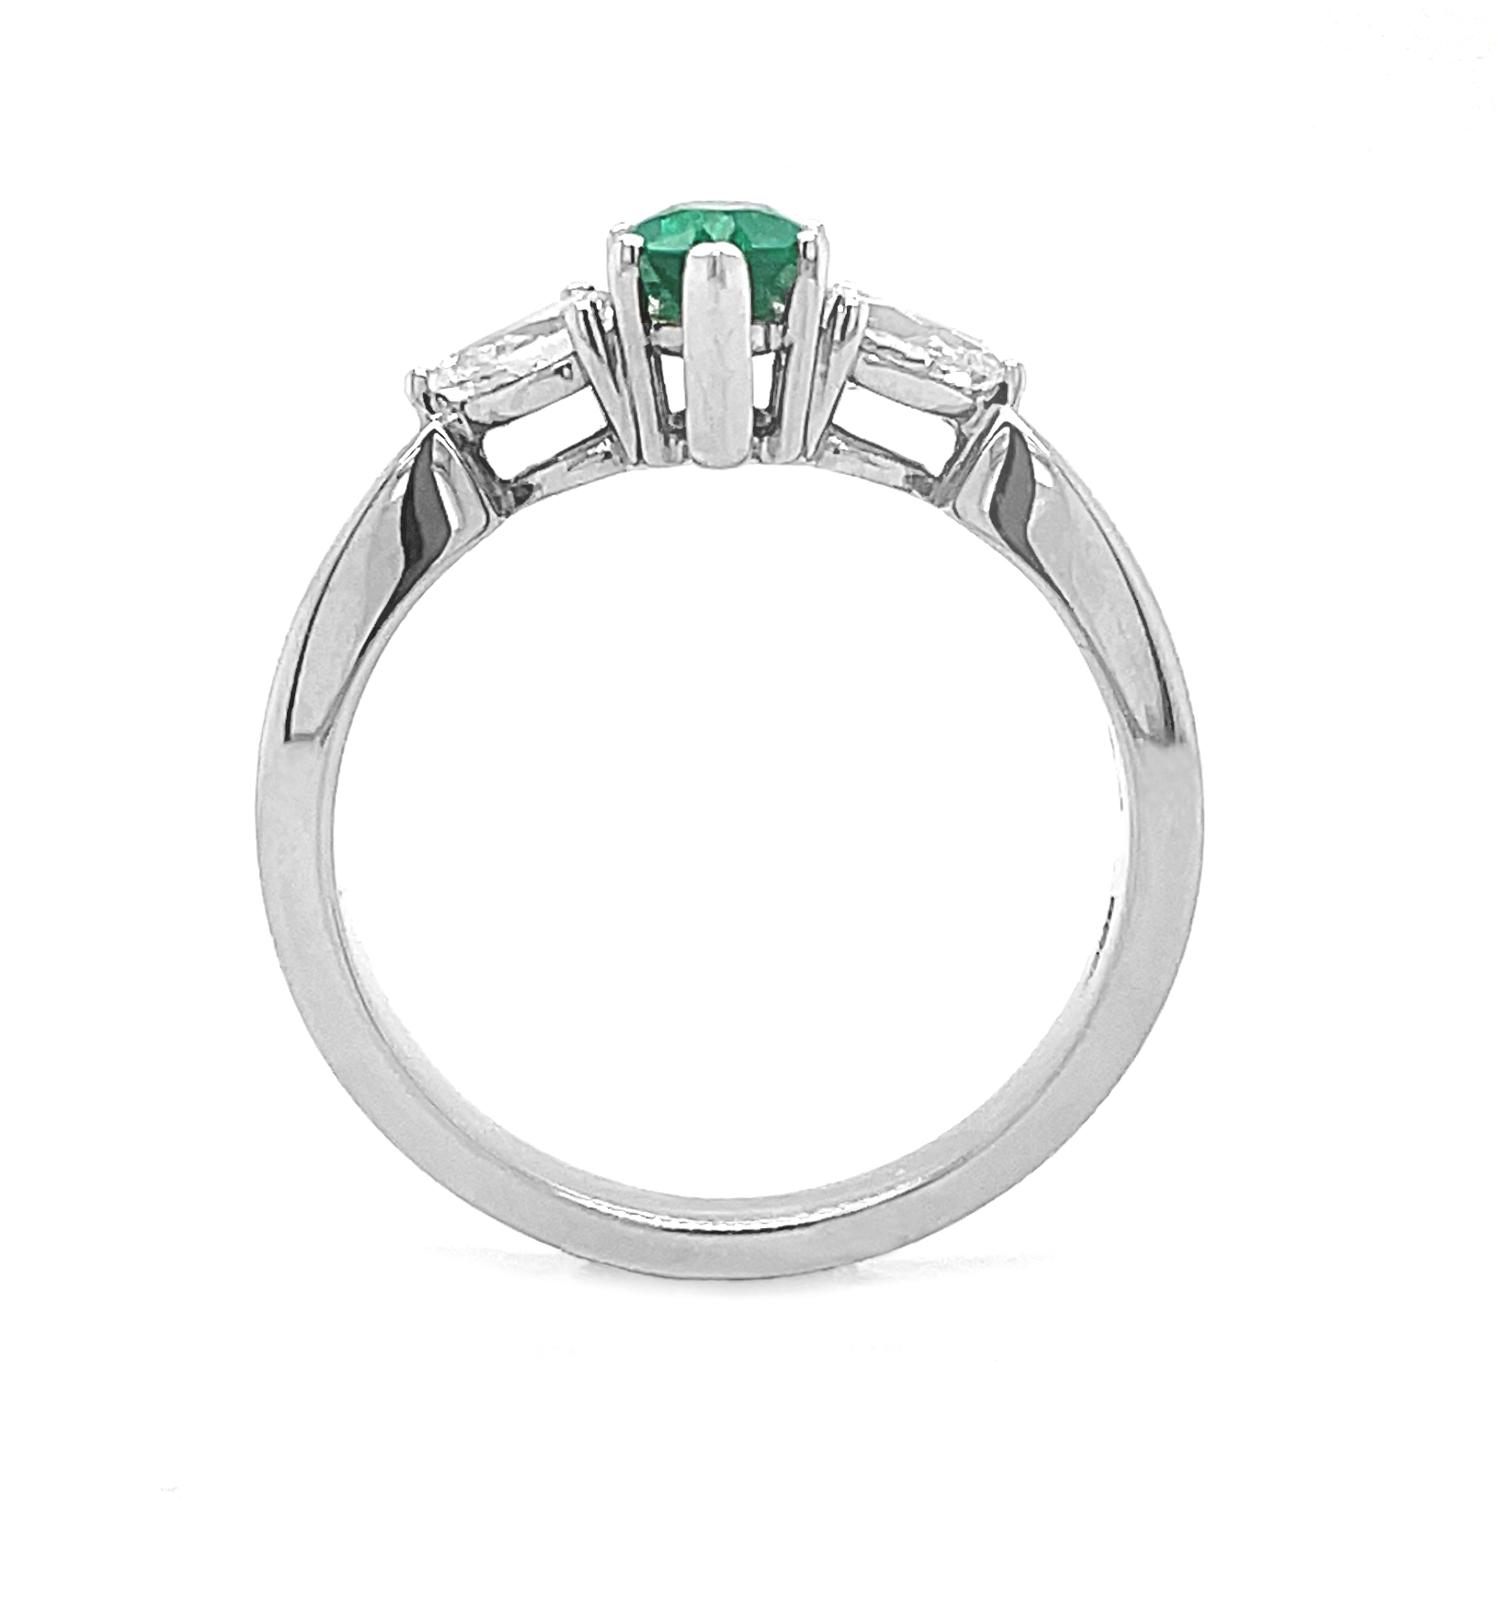 18k White Gold 3 Stone Marquise Emerald & Pearshape Diamond Ring